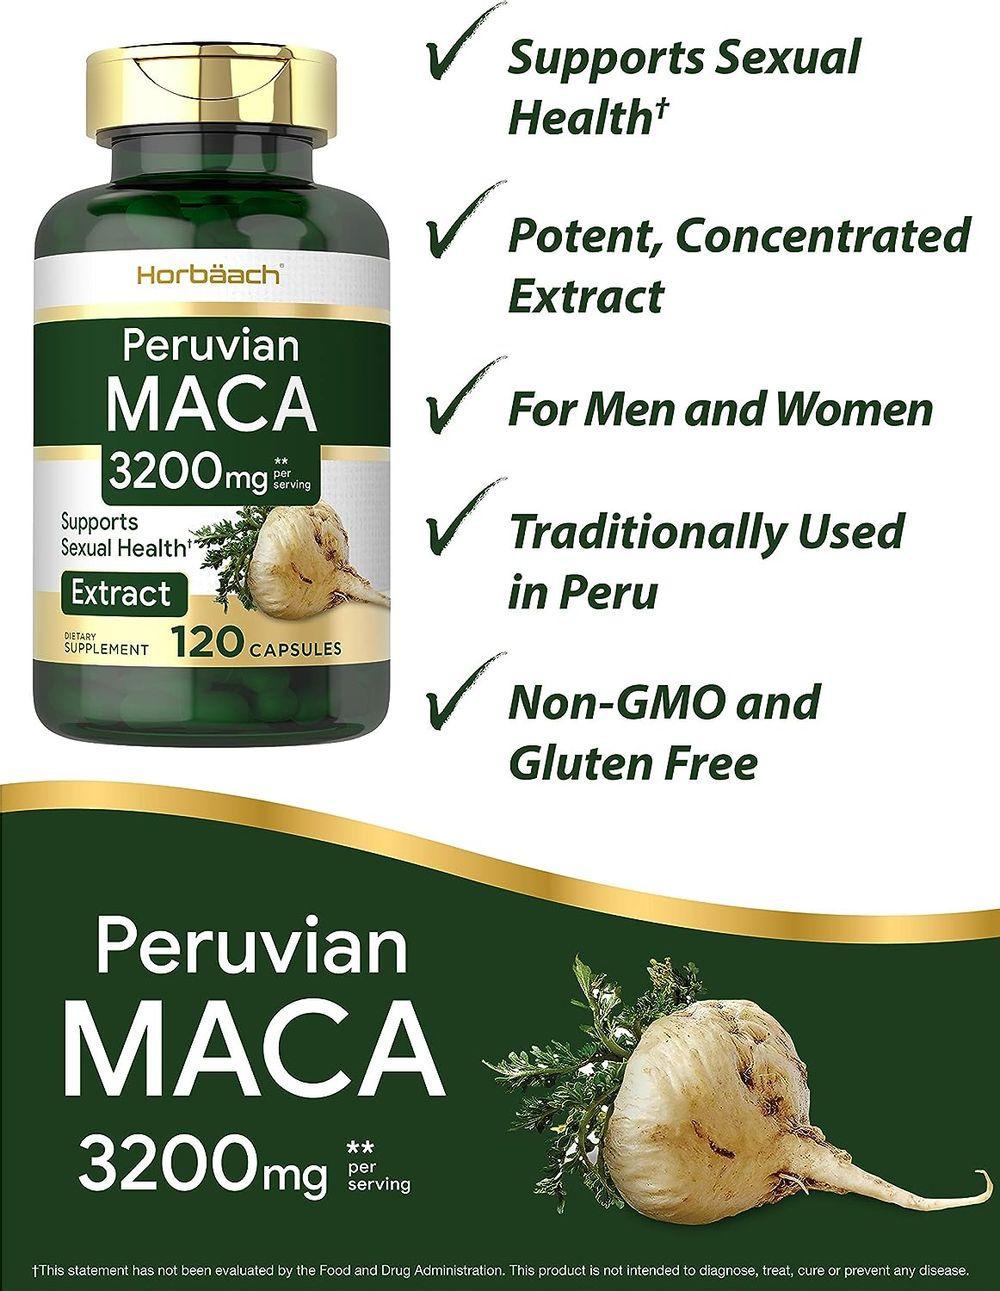 Maca Root Capsules 3200 mg   120 Pills   Peruvian Maca Extract for Men and Women   Non-GMO, Gluten Free   by Horbaach